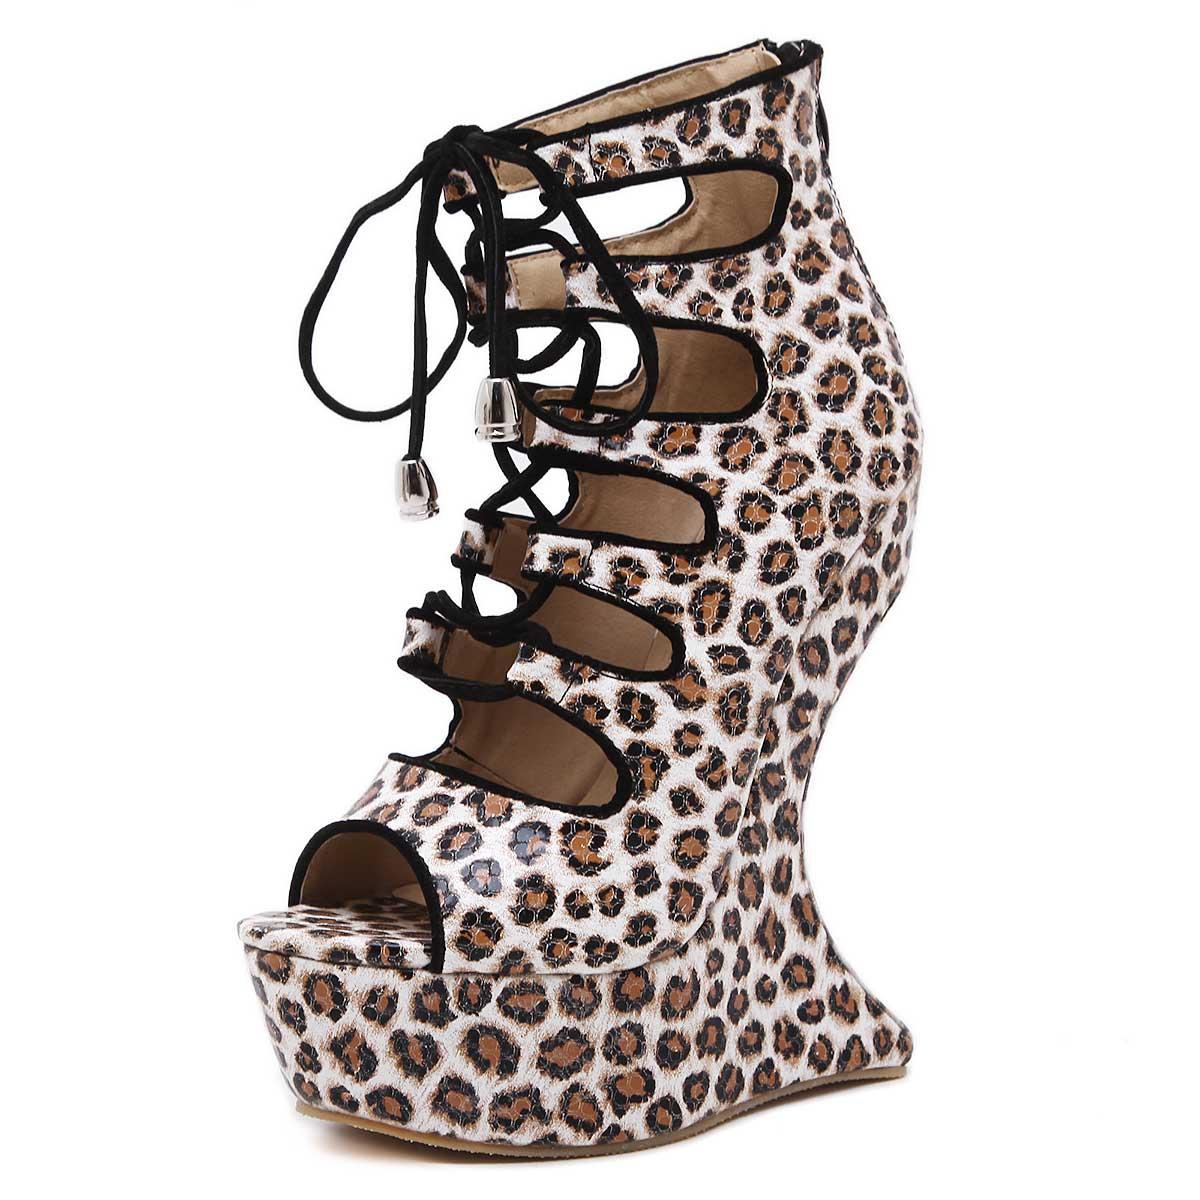 DoraTasia Sexy Leopard Women Sandals Gladiator 2017 High Heels Lace Up Strange Style Wedges Open Toe Platform Summer Shoes<br><br>Aliexpress